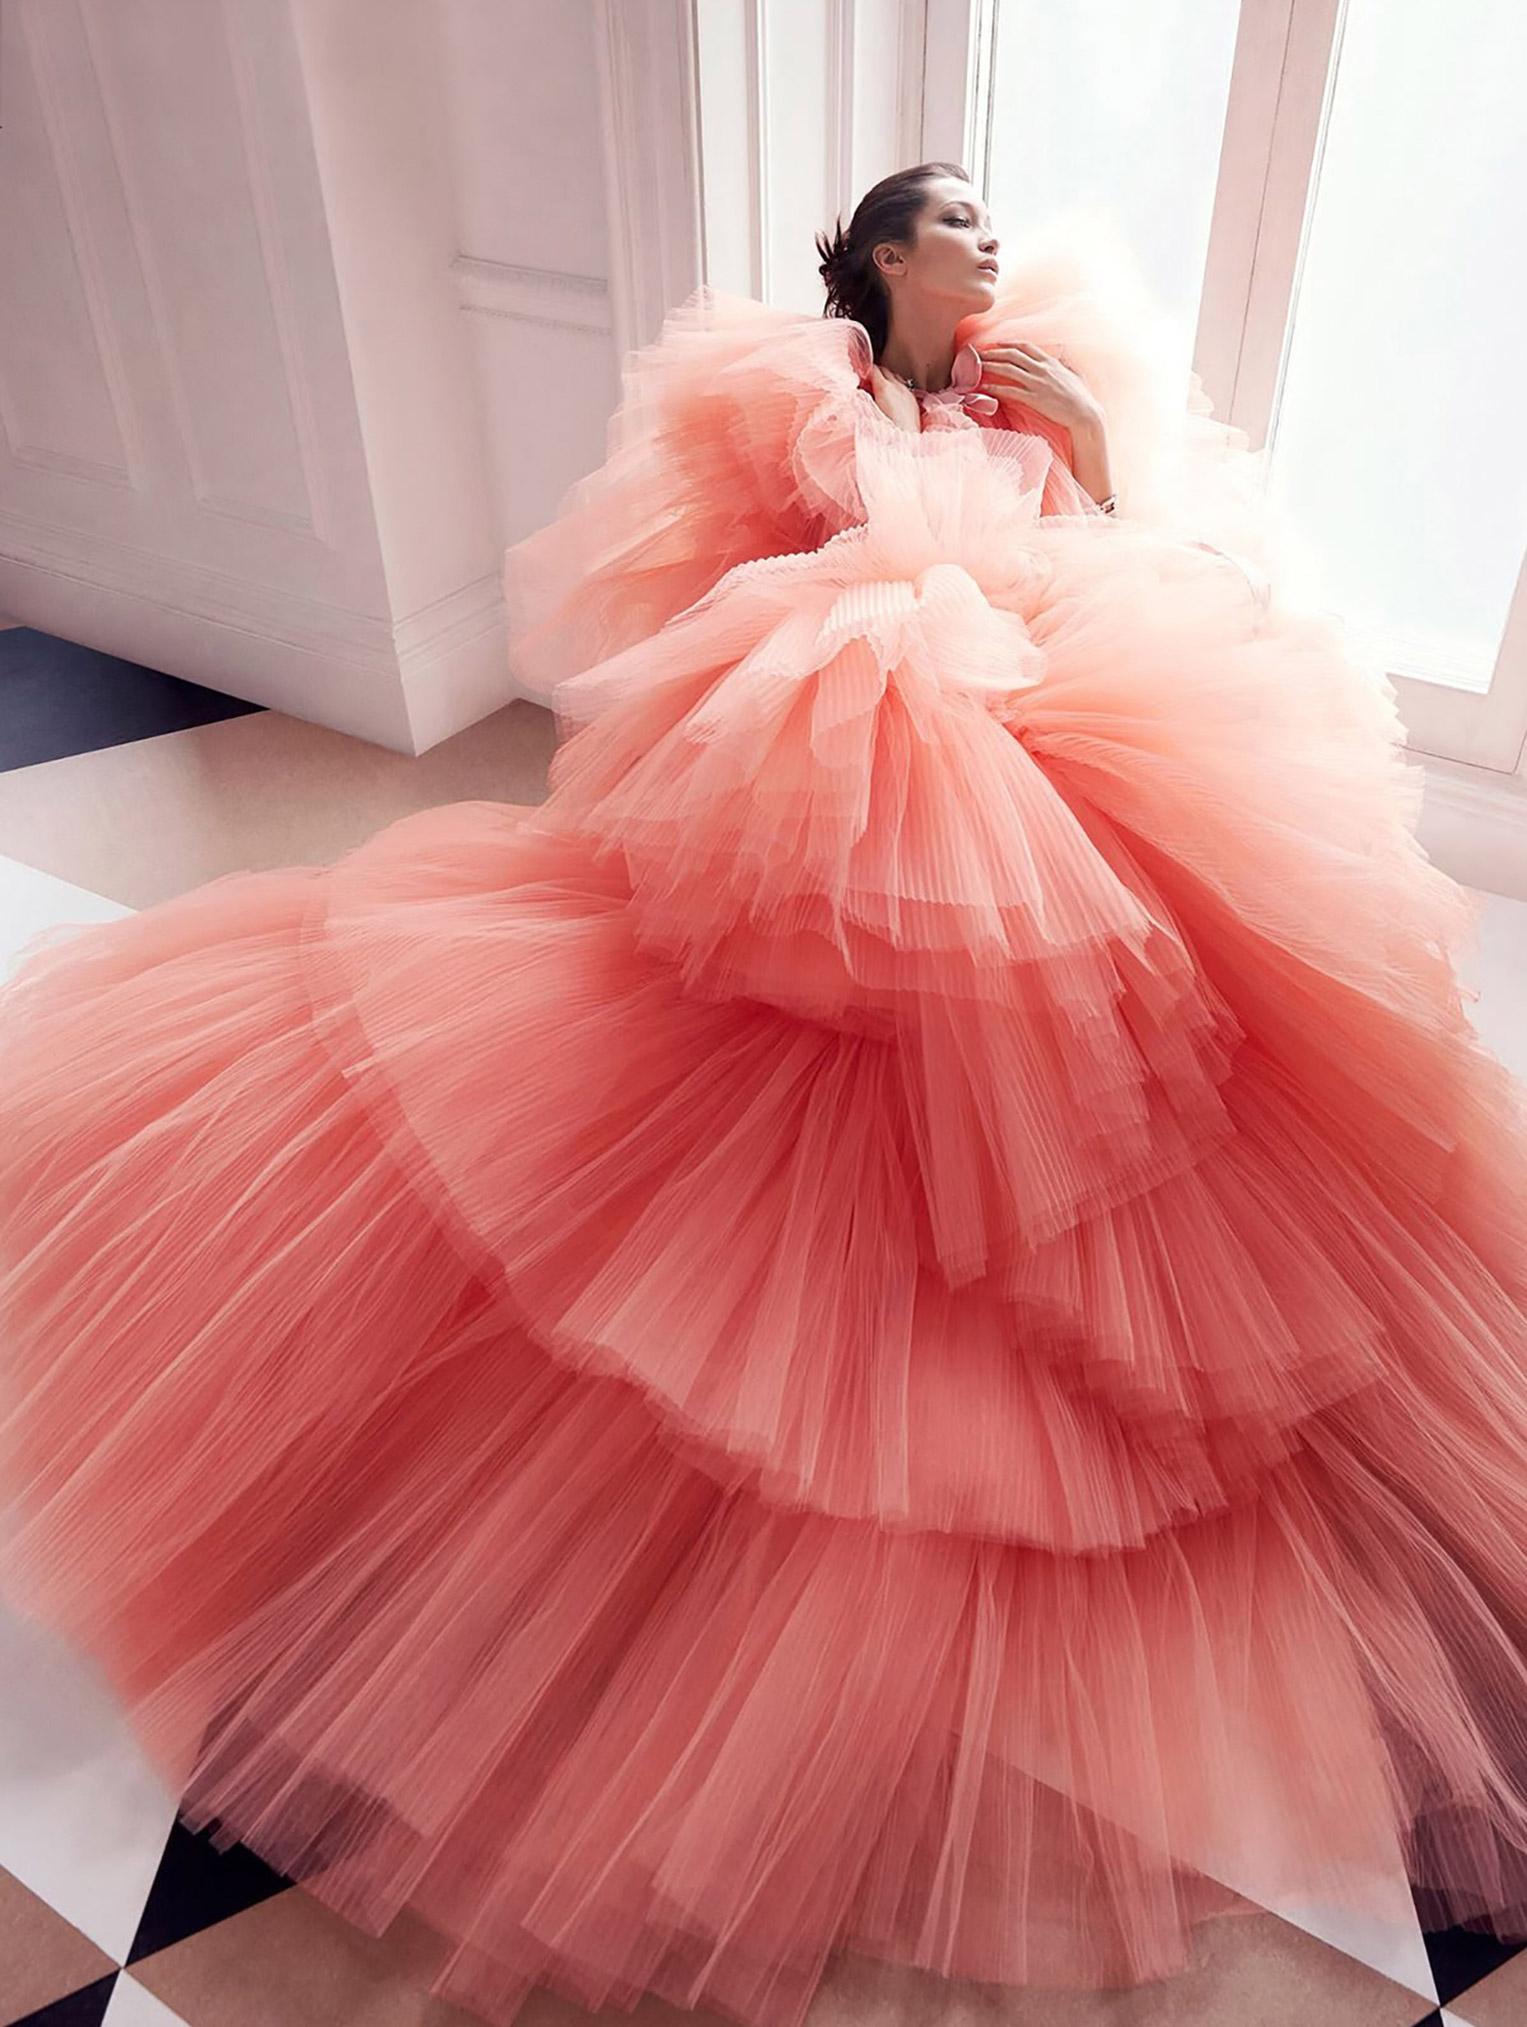 Bella Hadid by Solve Sundsbo / Harpers Bazaar US june/july 2018